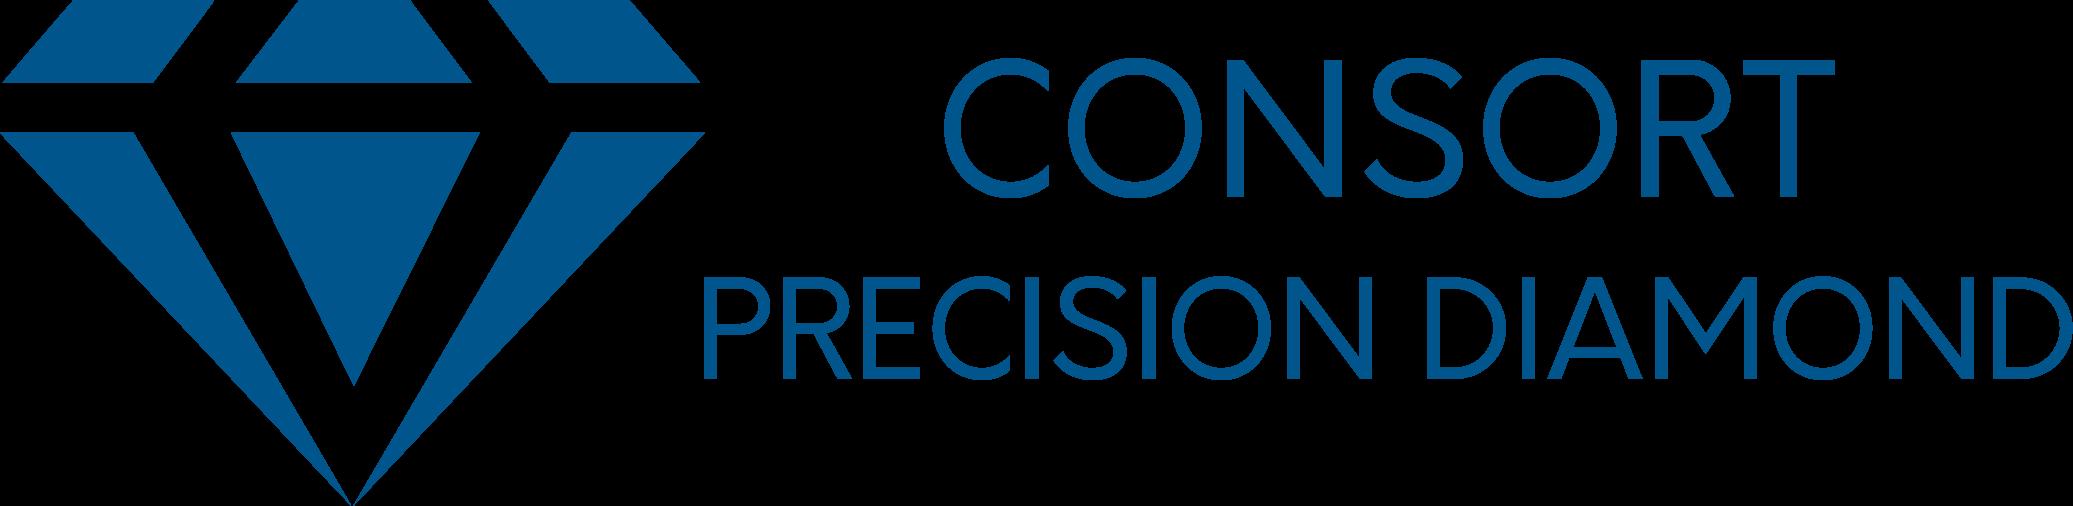 Consort-Precision-Diamond-Logo.png